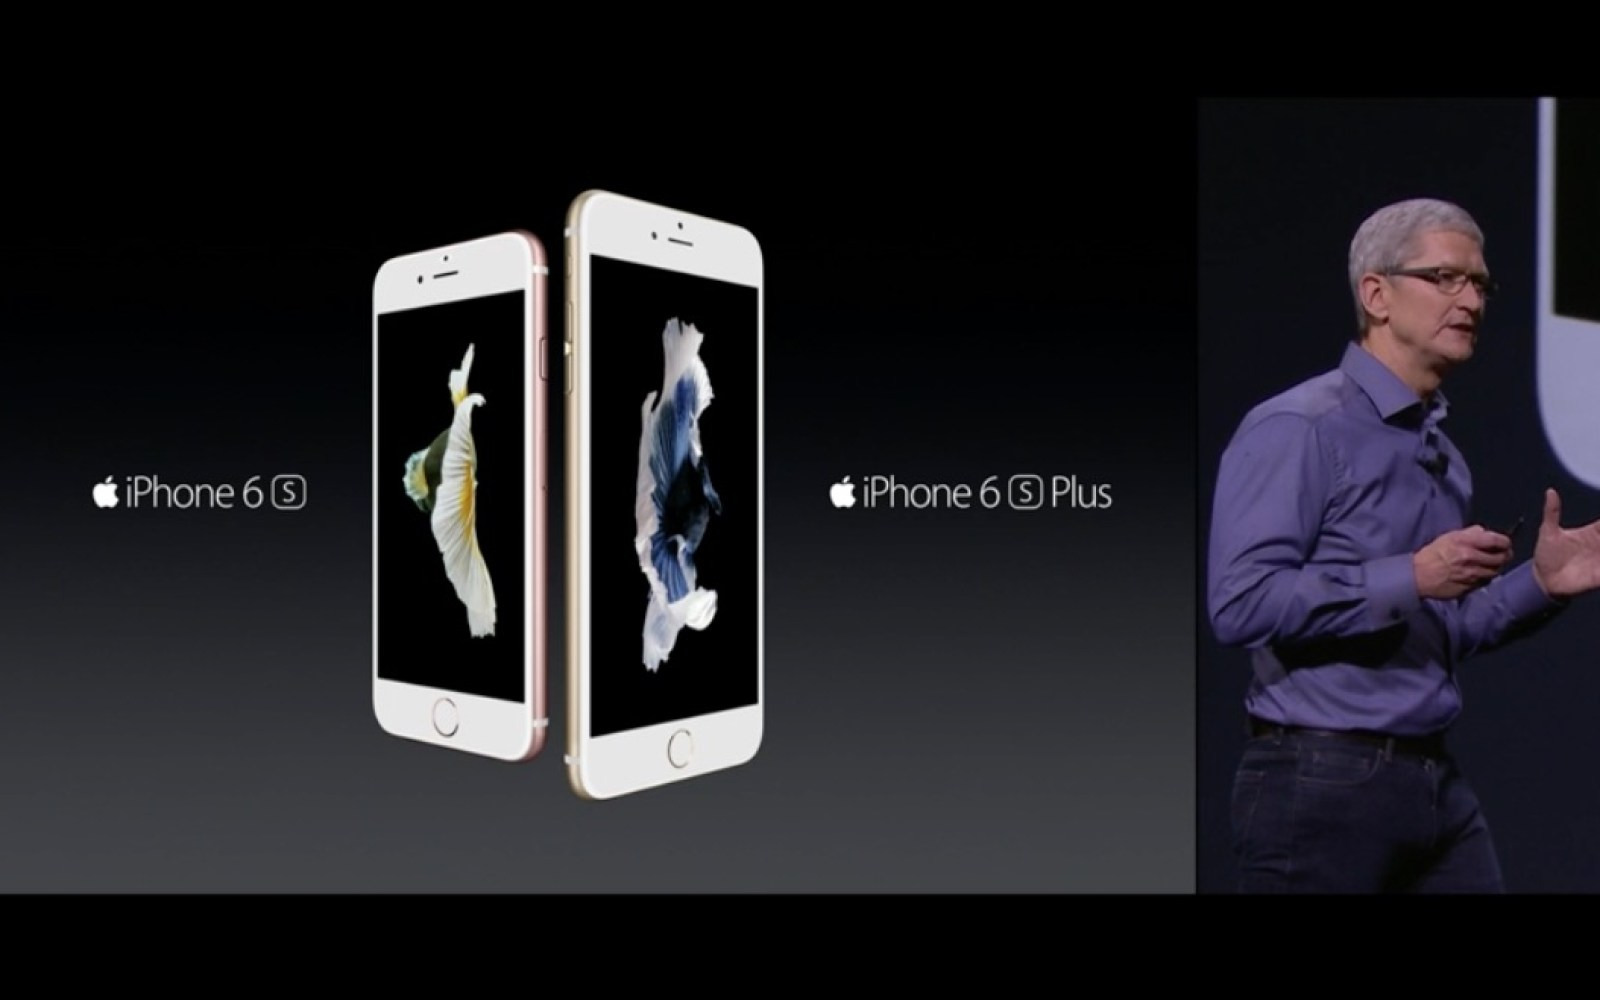 Apple debuts iPhone 6s + iPhone 6s Plus